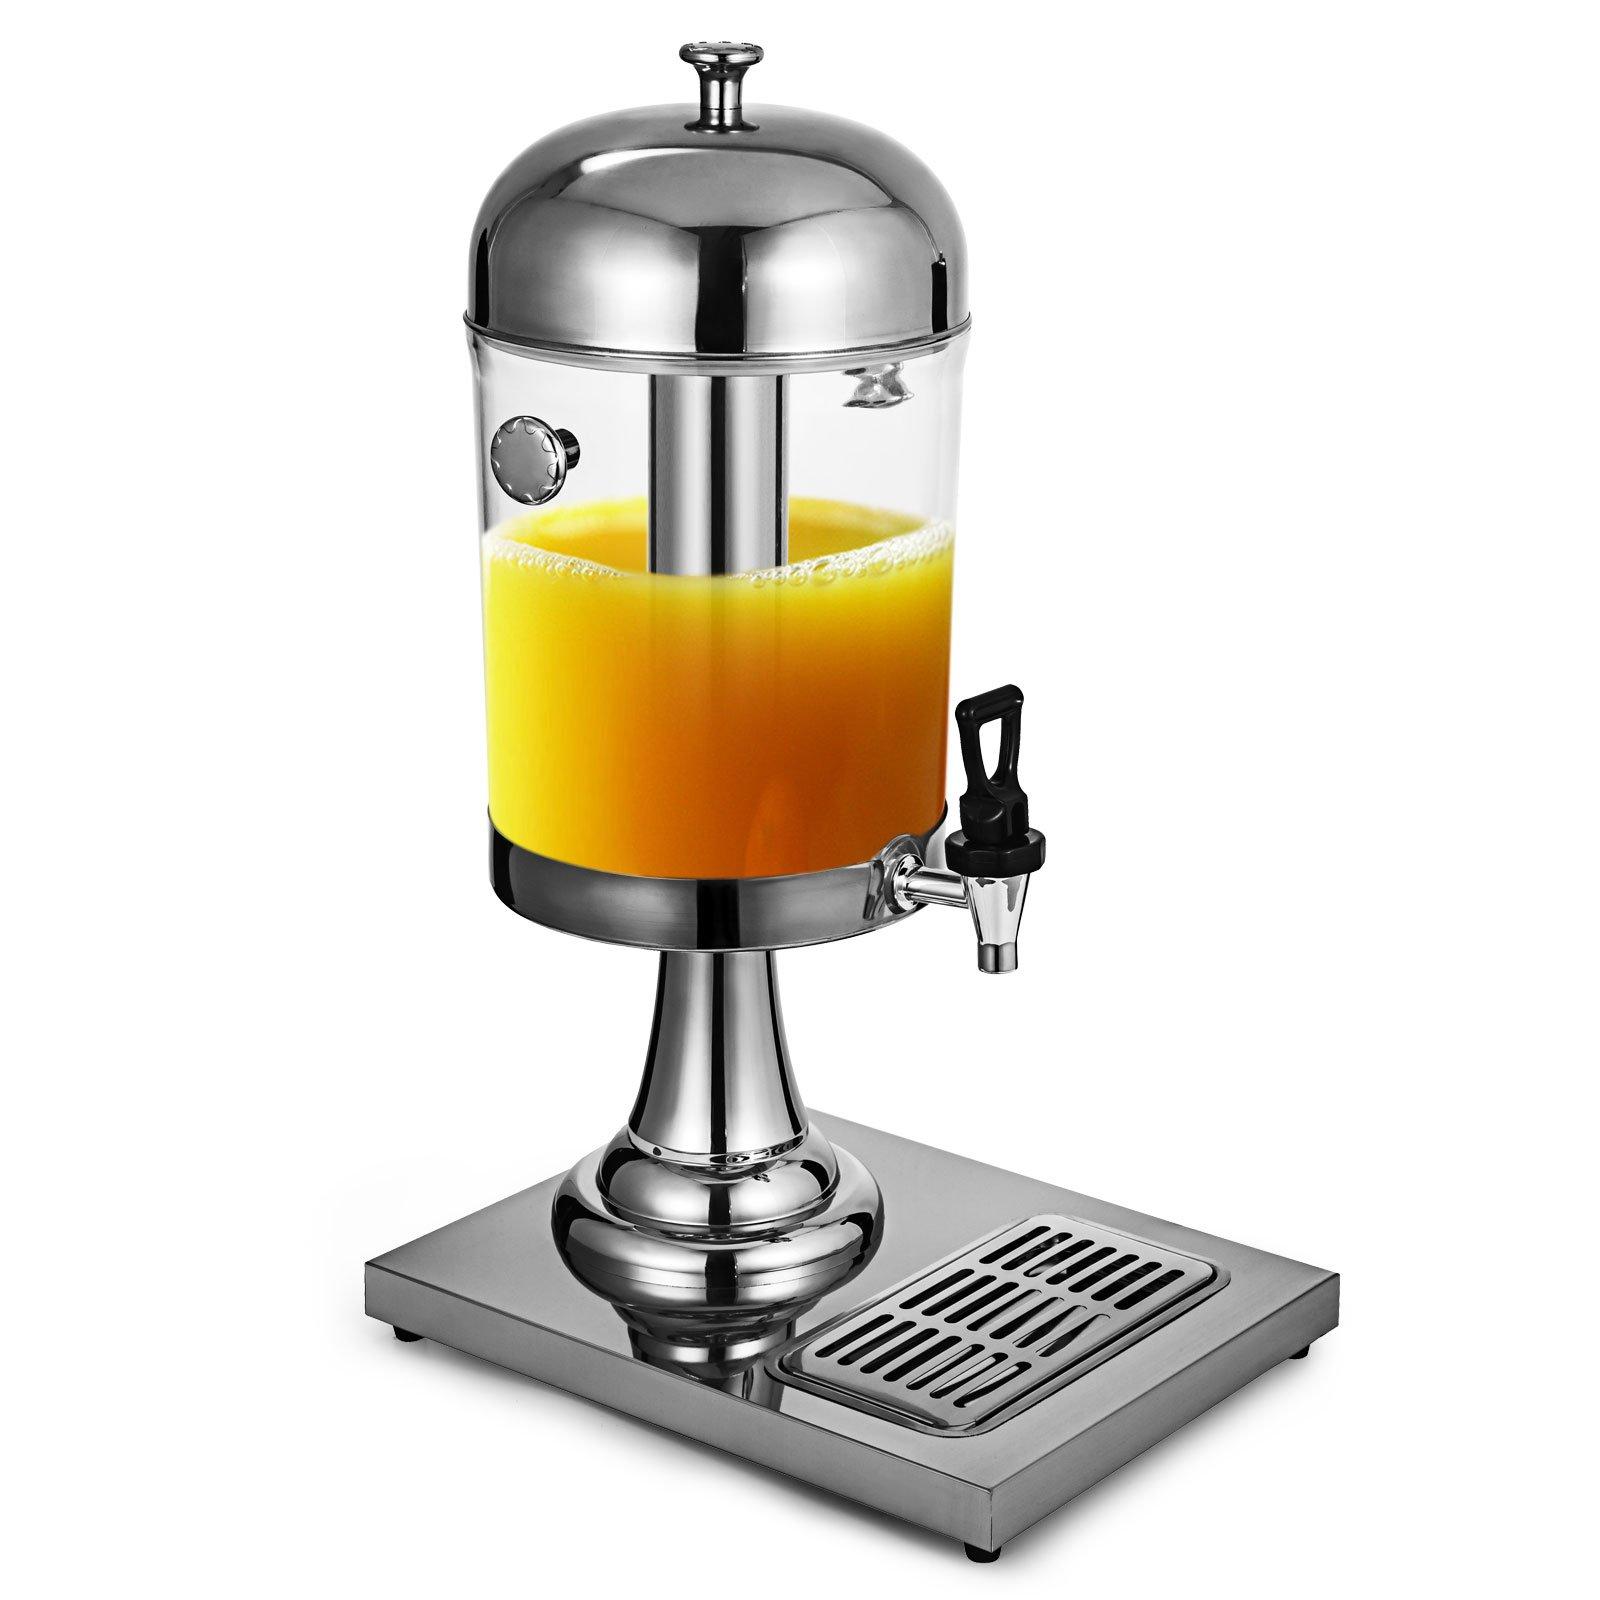 OrangeA Round Stainless Steel Beverage Drink Dispensers 8L/2.1 Gallon Heavy Duty Cold Juice Drink Commercial Dispenser Beverage dispenser (8L)